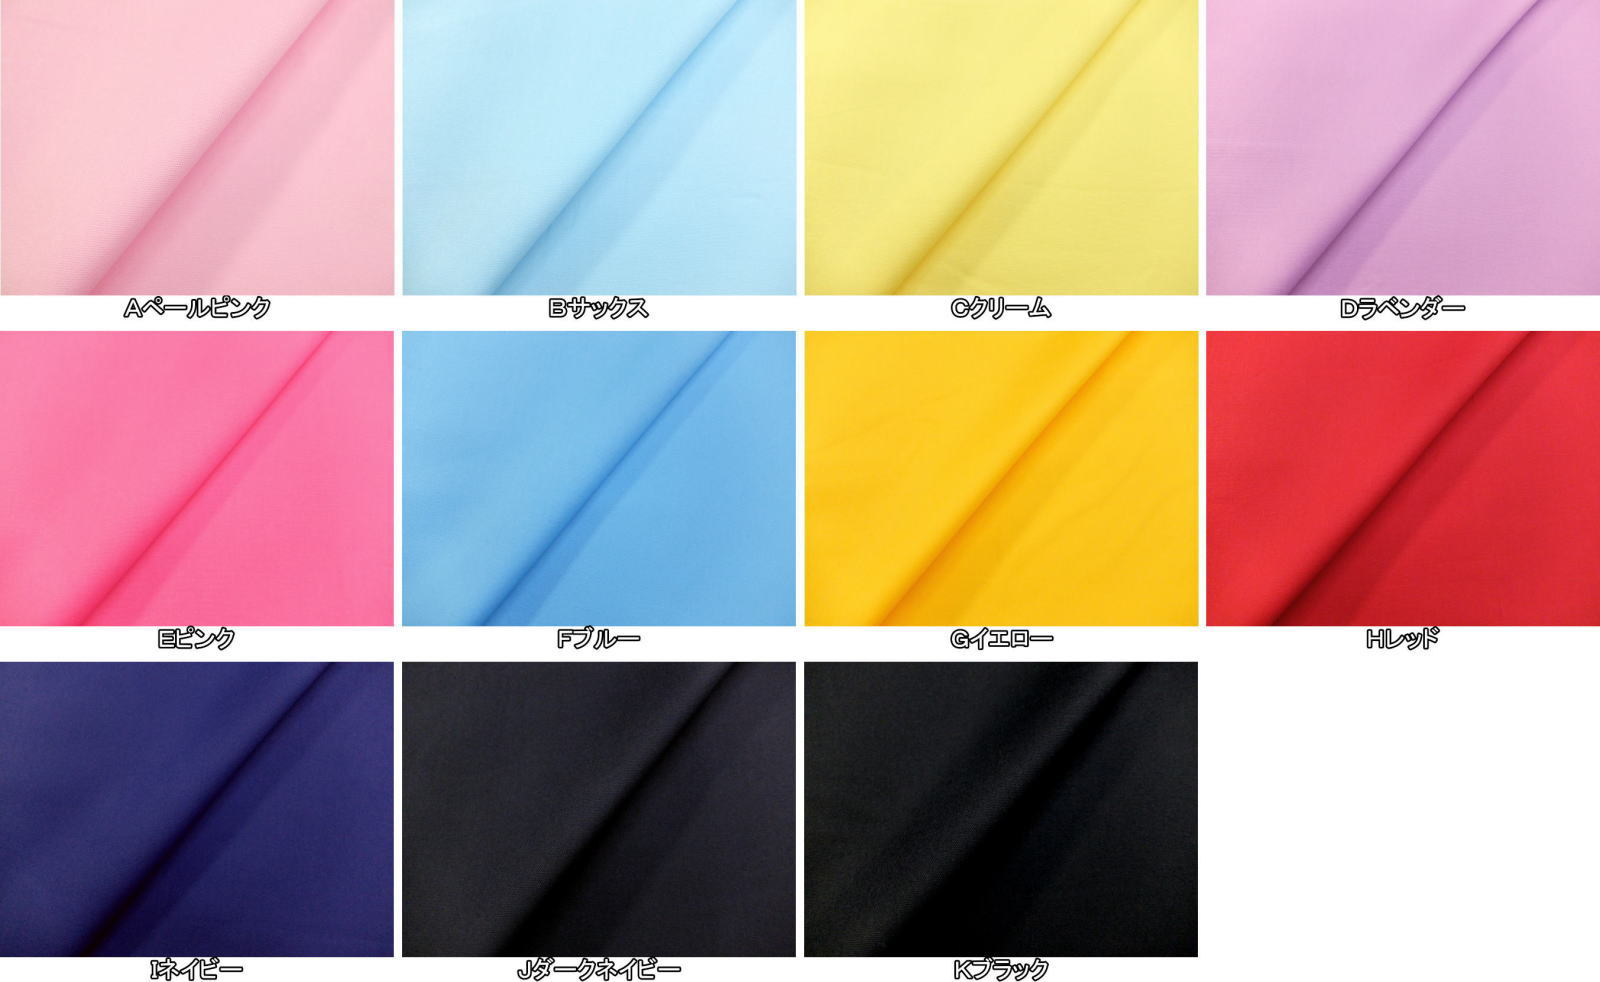 F1011-1 入園入学 オックス 生地 布 無地 F1011-1 バッグの切り替えしや裏地に最適 レッスンバッグ 体操着入れ 巾着袋に 商用利用可能